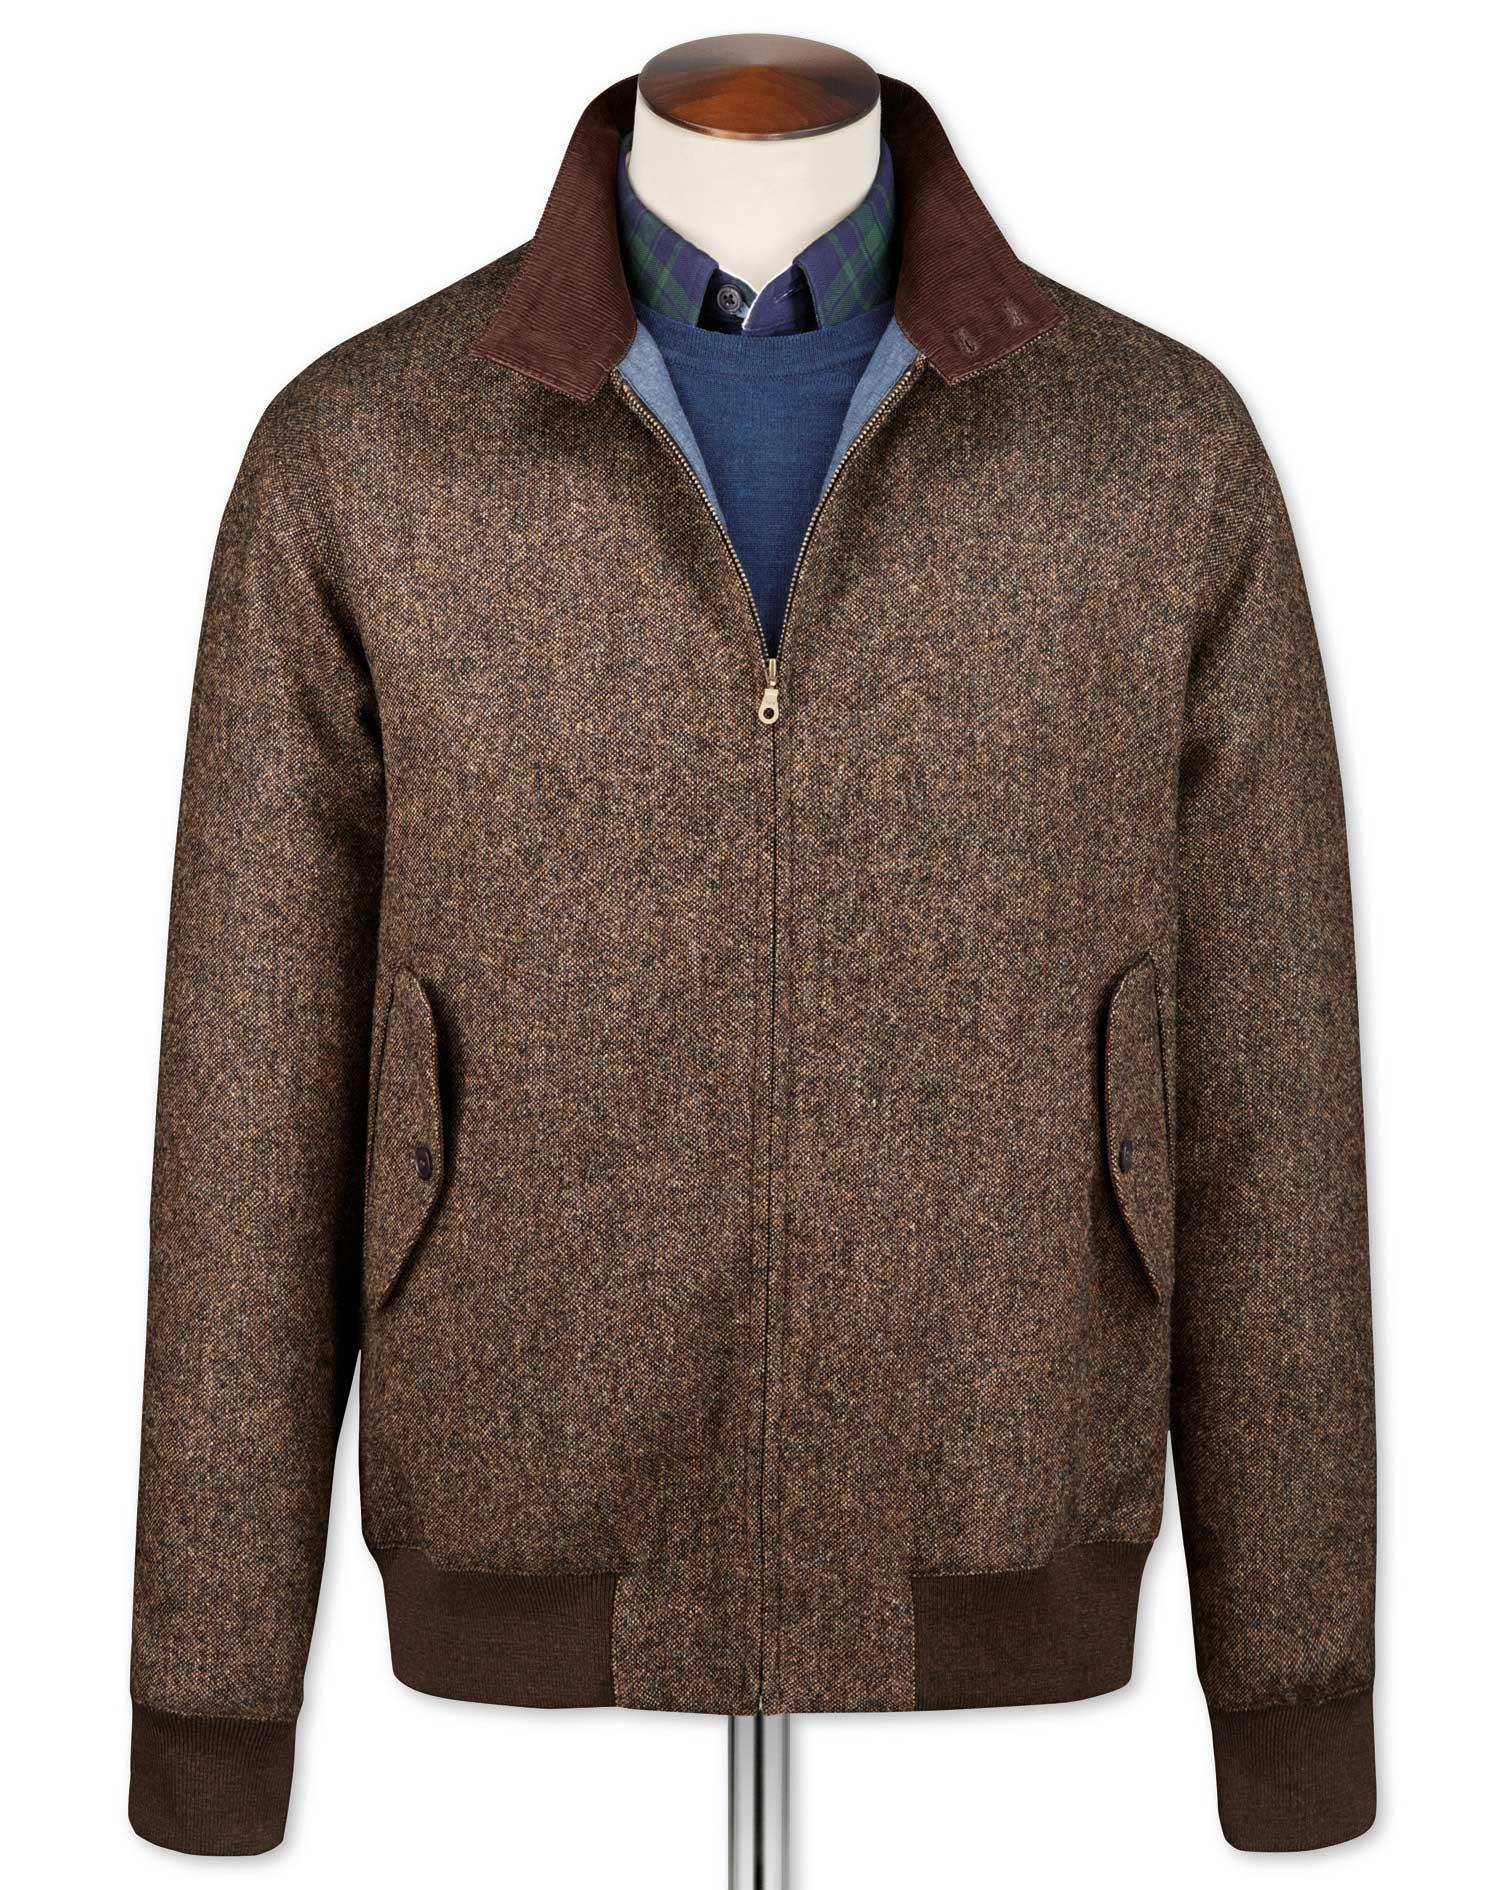 Brown Harrington Wool Jacket Size 46 Regular by Charles Tyrwhitt